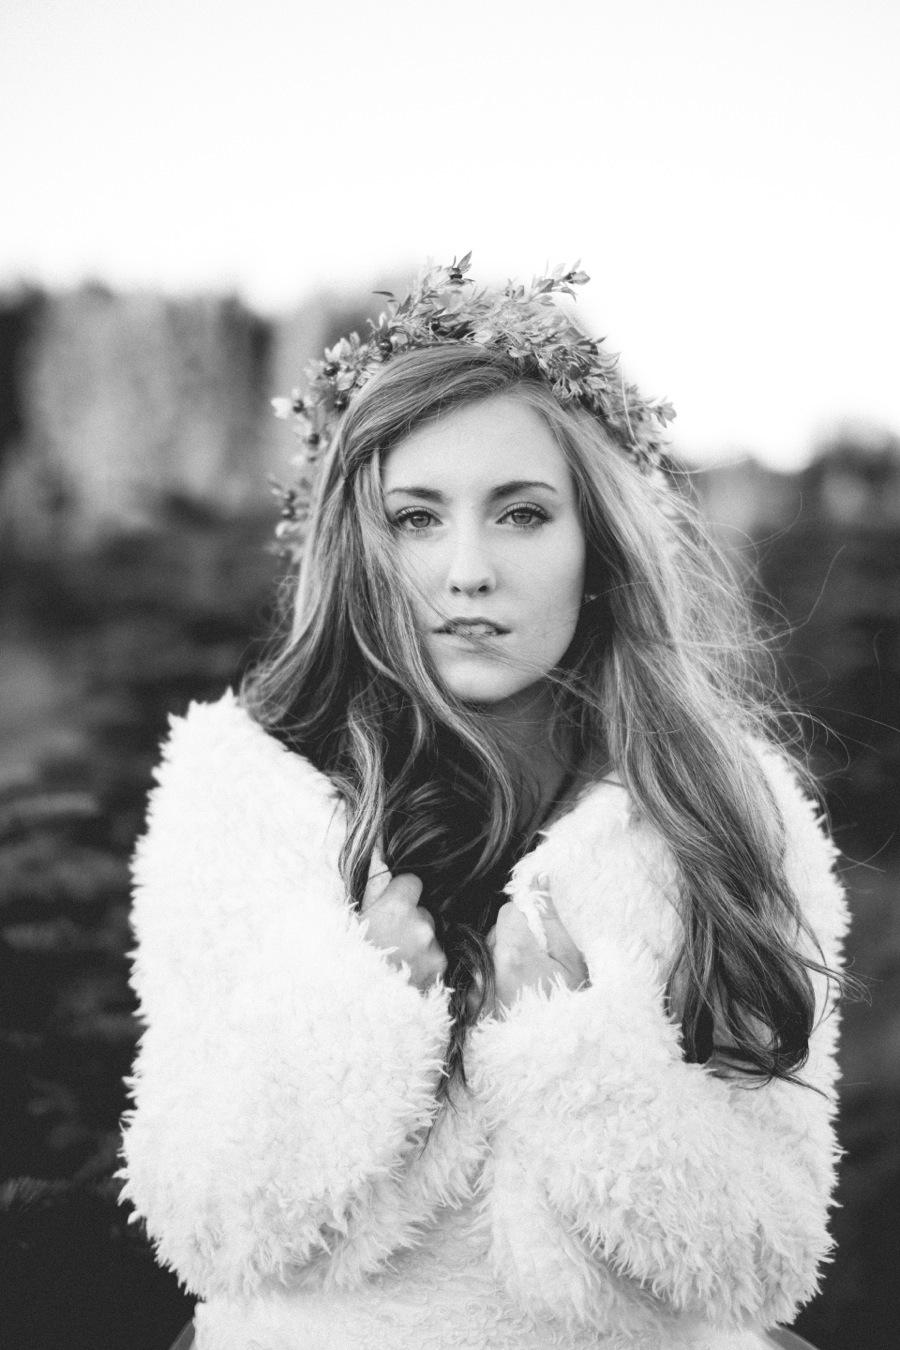 kylee-ann-photography-winter-bride1